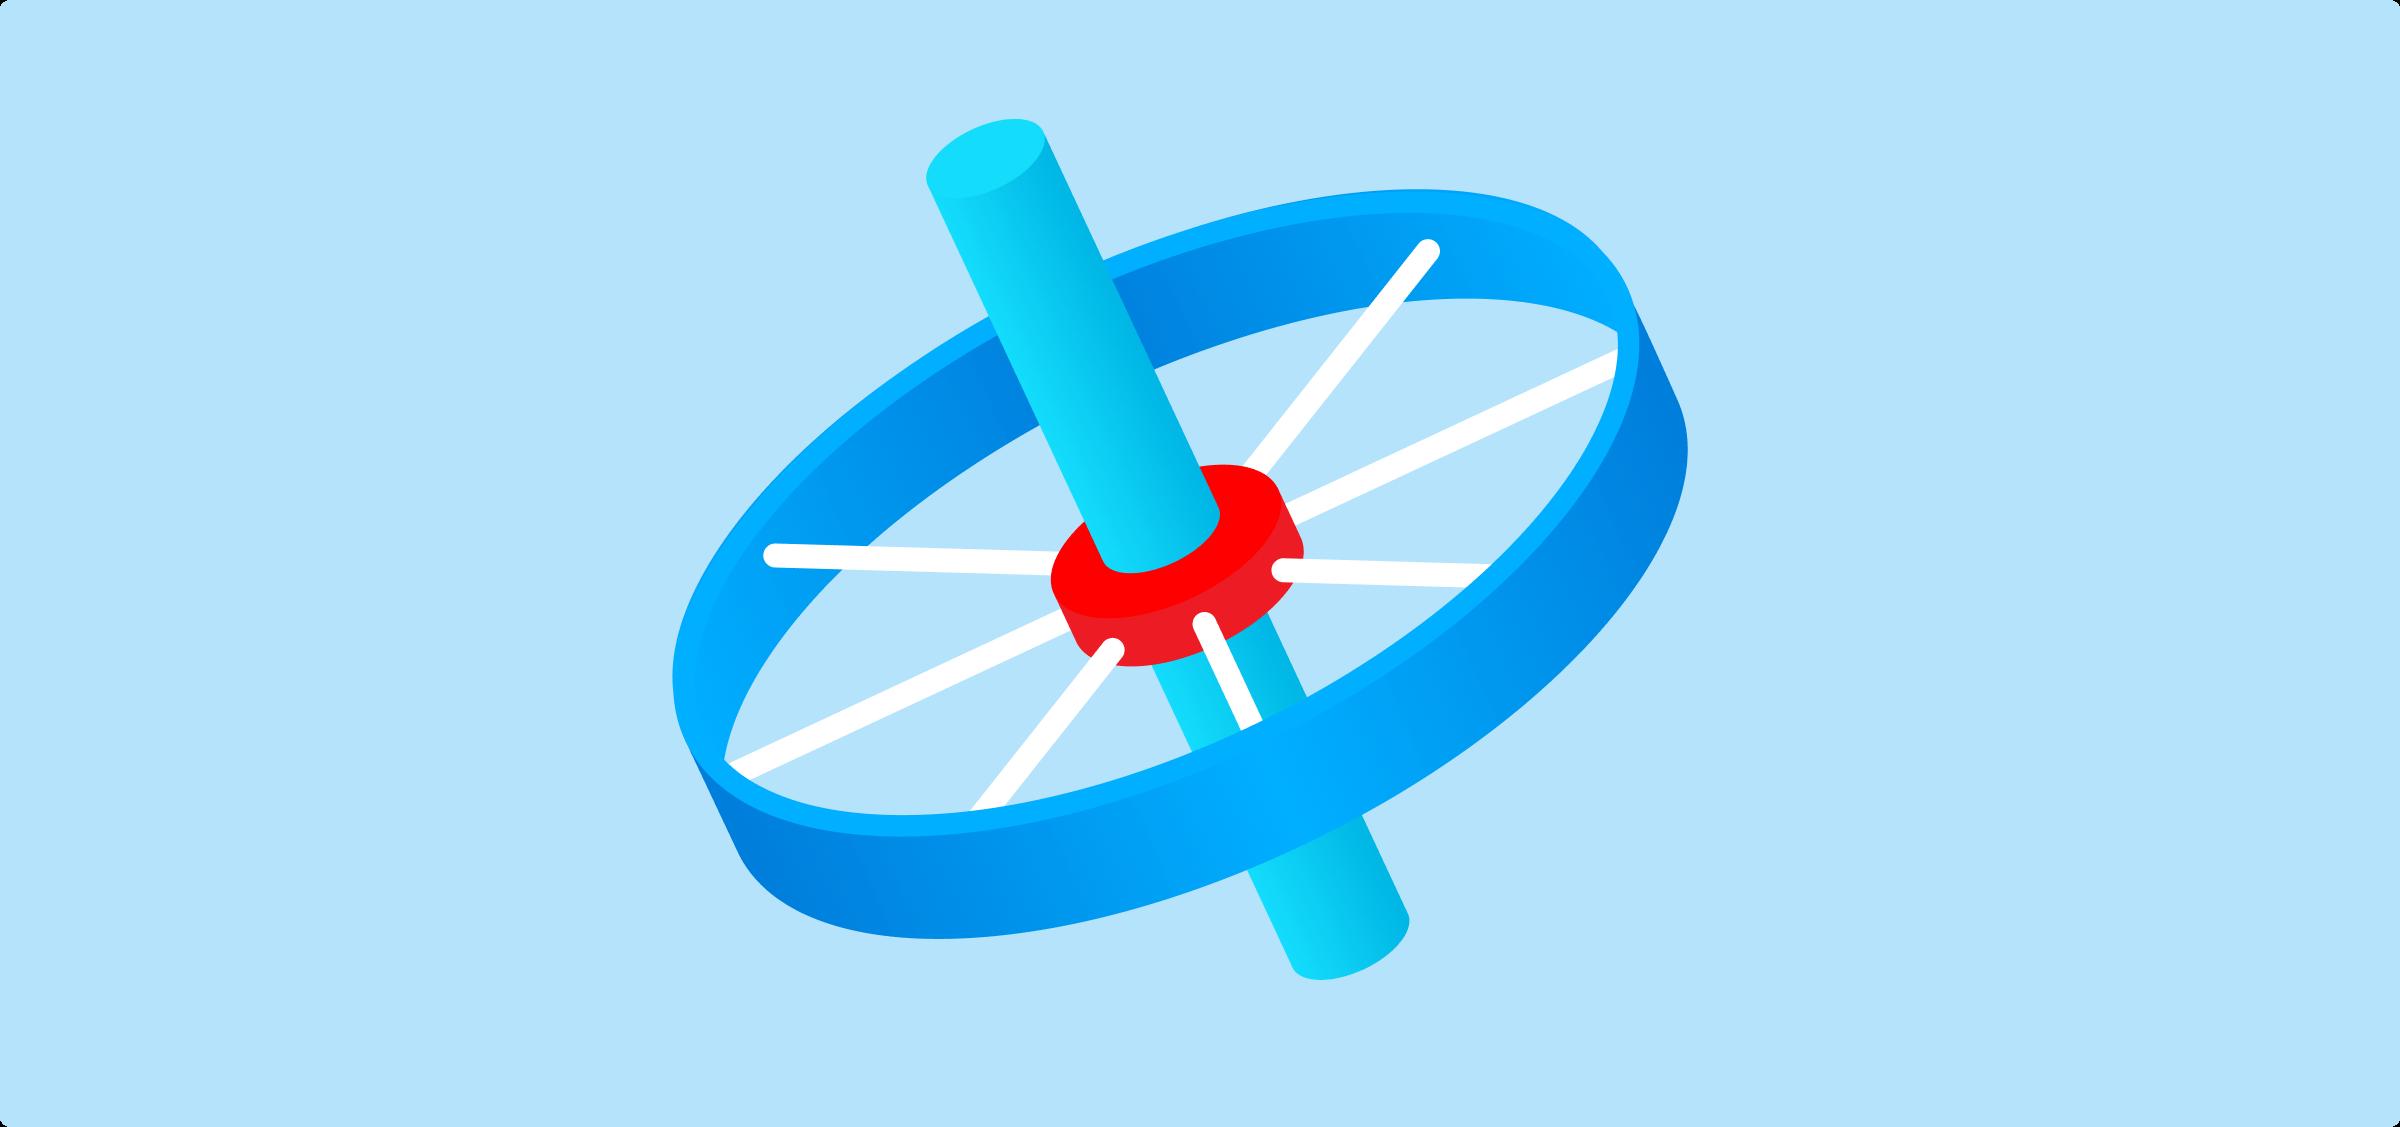 Wheel hub and spokes